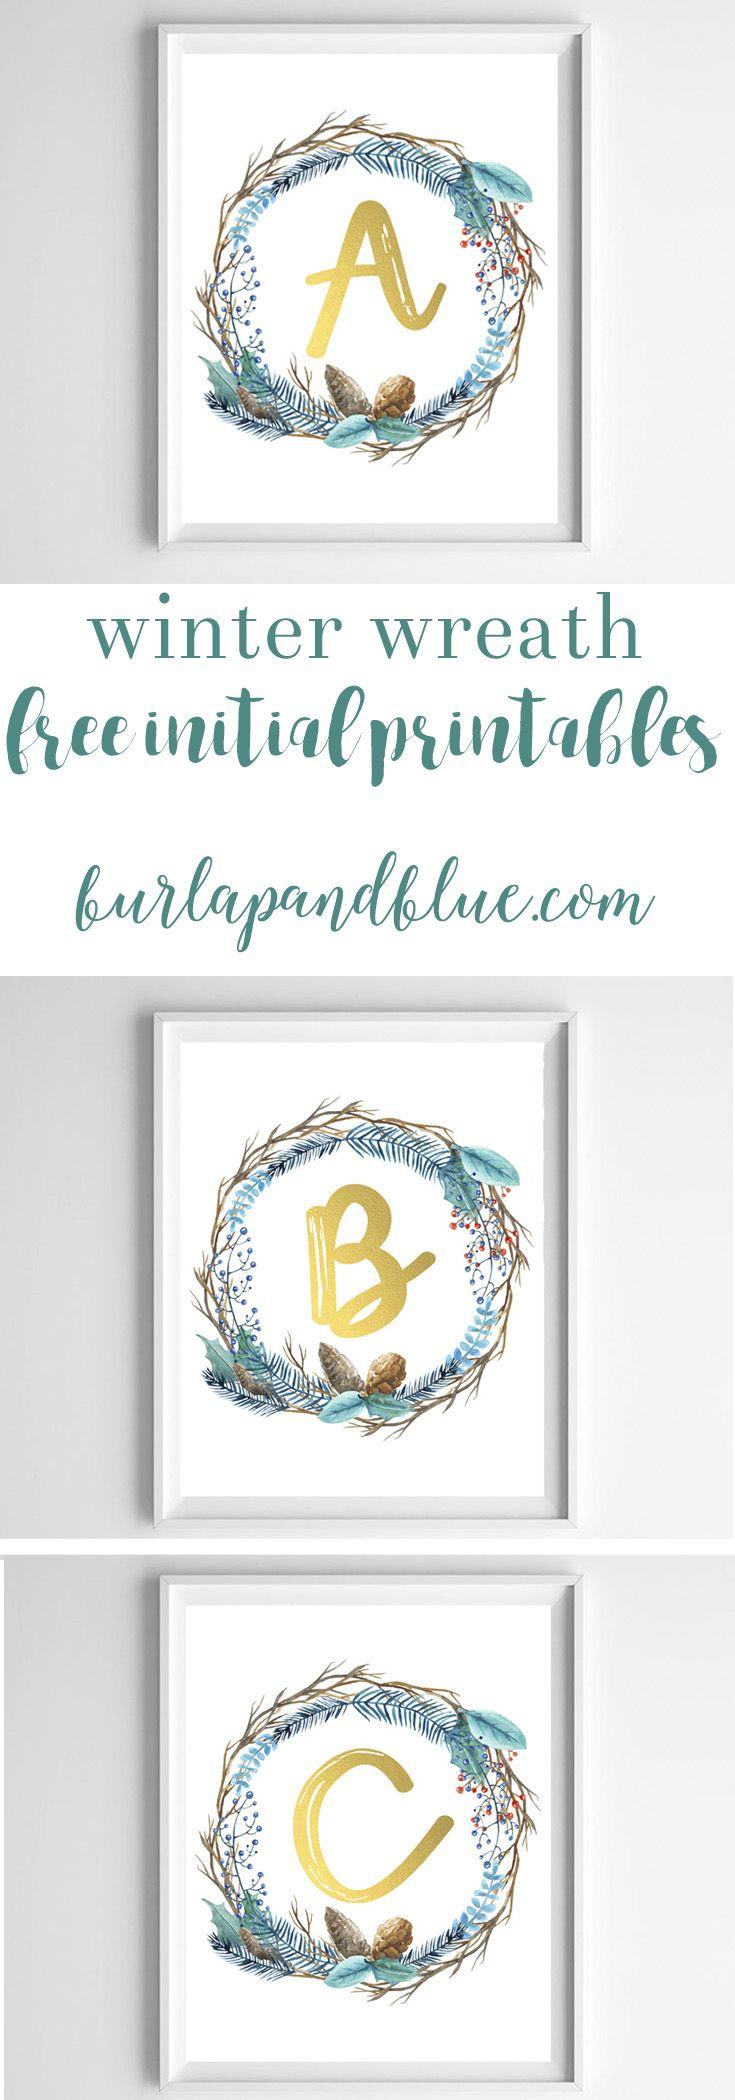 Printable Room Decor Over 35 Free Printables For The Home Lots Of Printable Art Wall